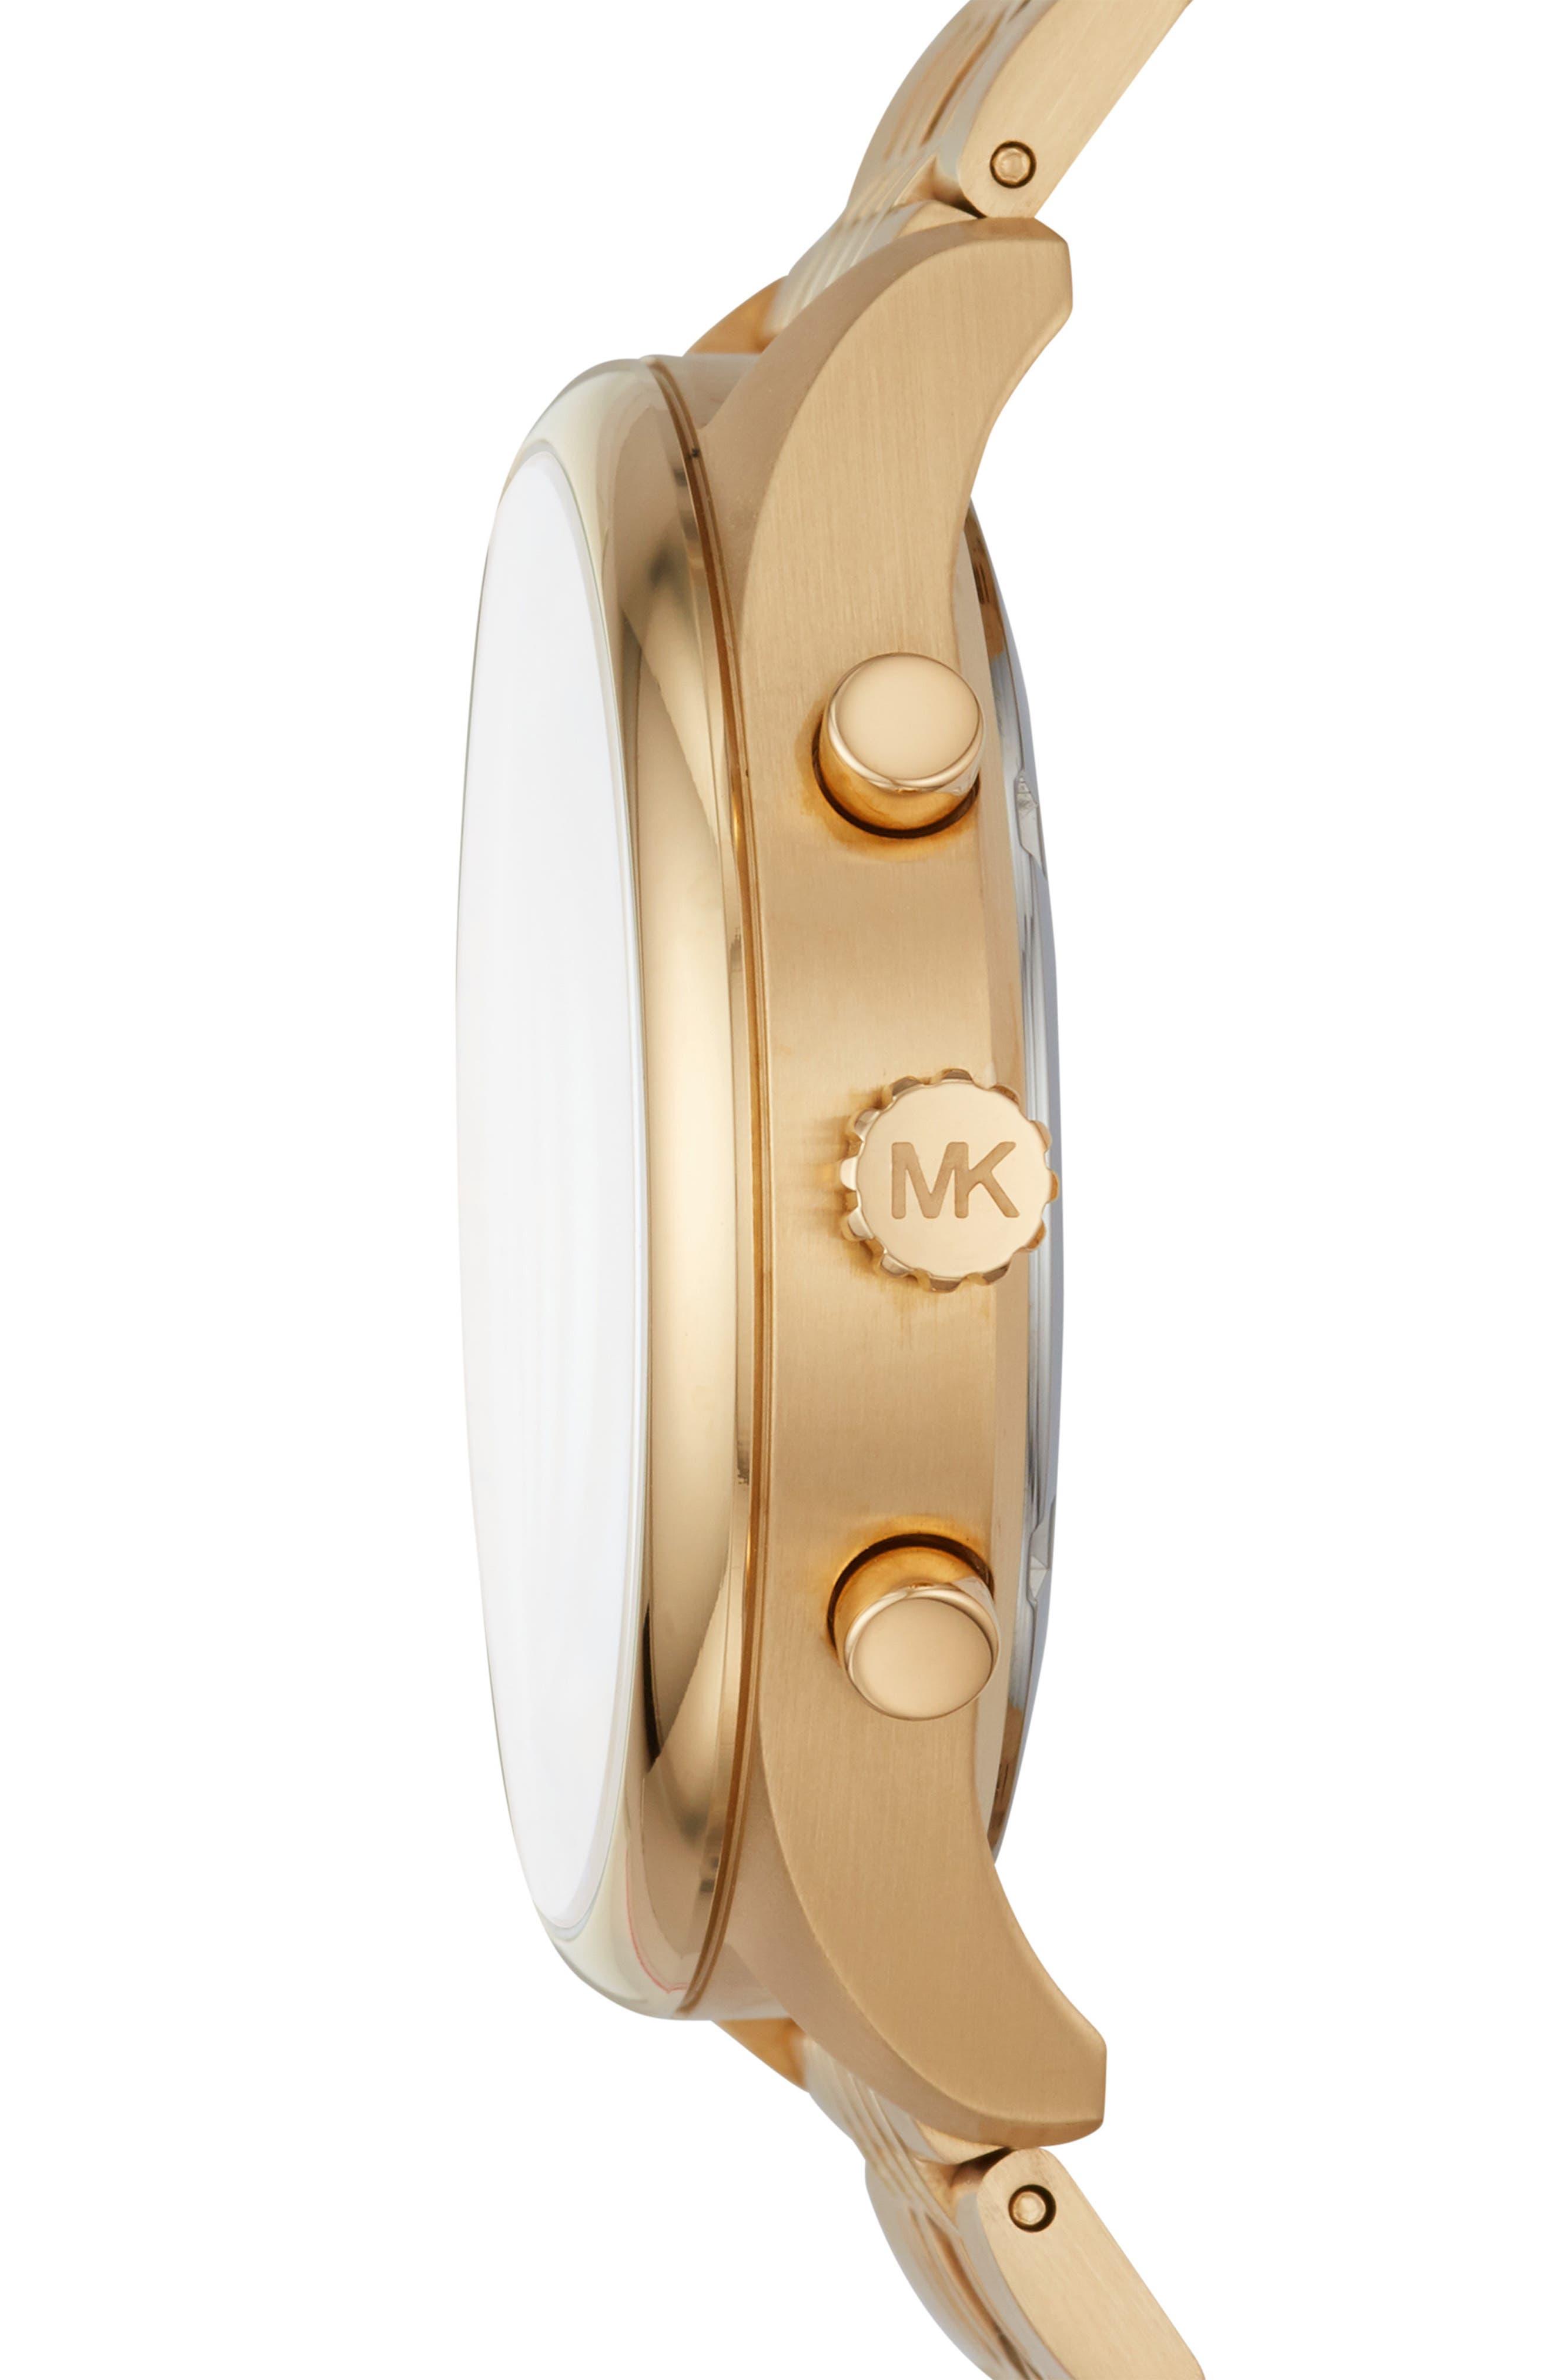 MICHAEL KORS, Merrick Bracelet Watch, 42mm, Alternate thumbnail 2, color, GOLD